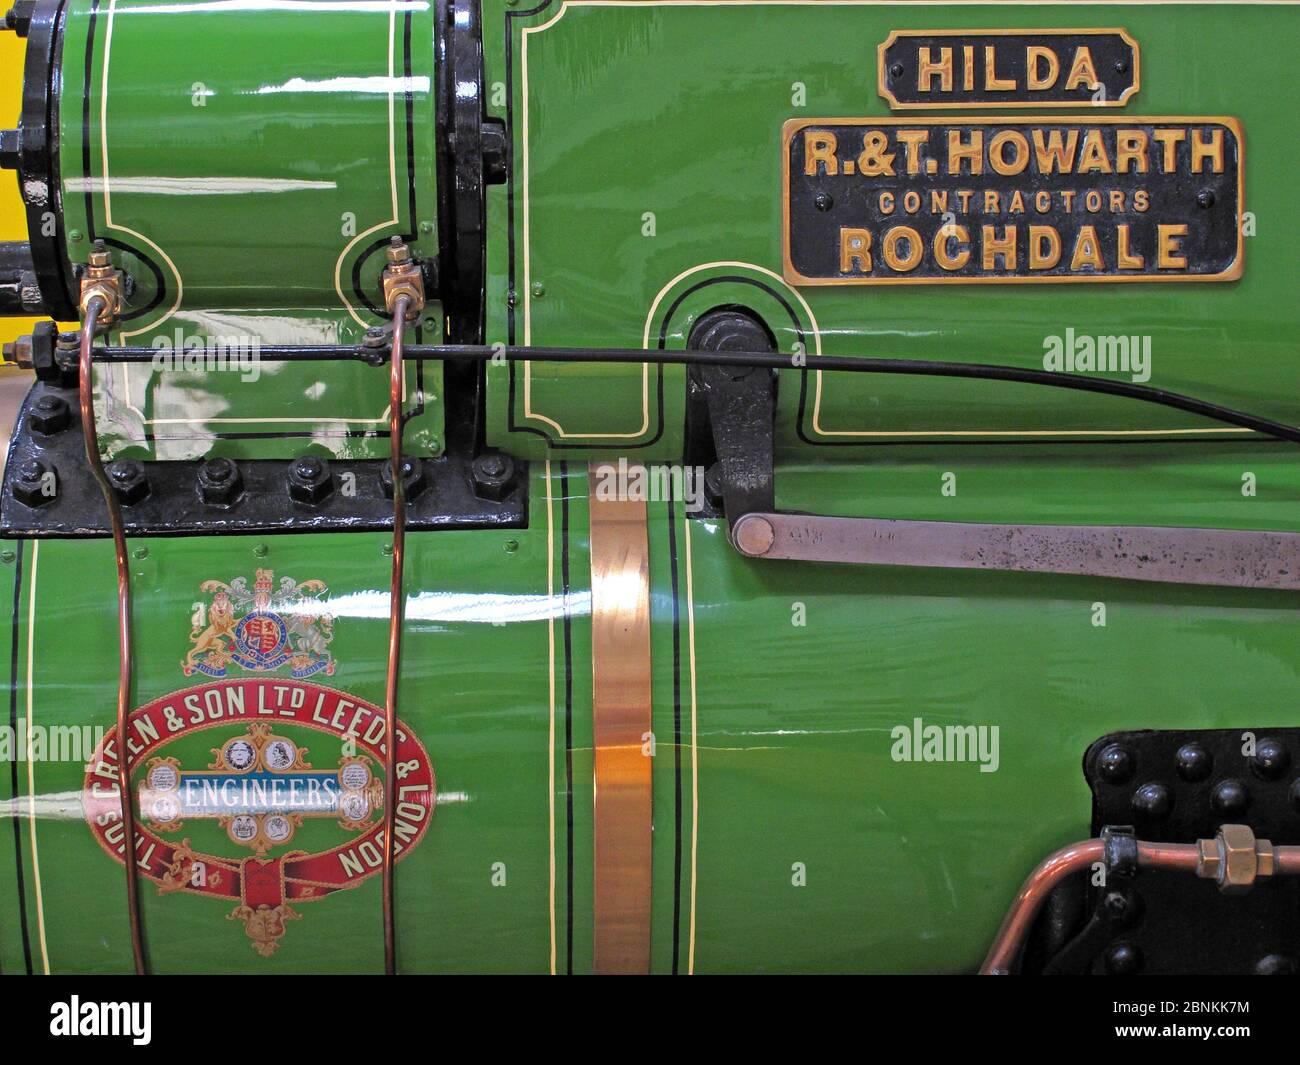 HotpixUK,@HotpixUK,GoTonySmith,Bury Bolton Street,Bury,Greater Manchester,Bolton Street,ELR,East Lancs Railway,East Lancashire Railway,heritage,railway,transport,BL9,Thomas Green,Leeds,London,Green steam engine,steam,engine,Victorian,brass,steam engine